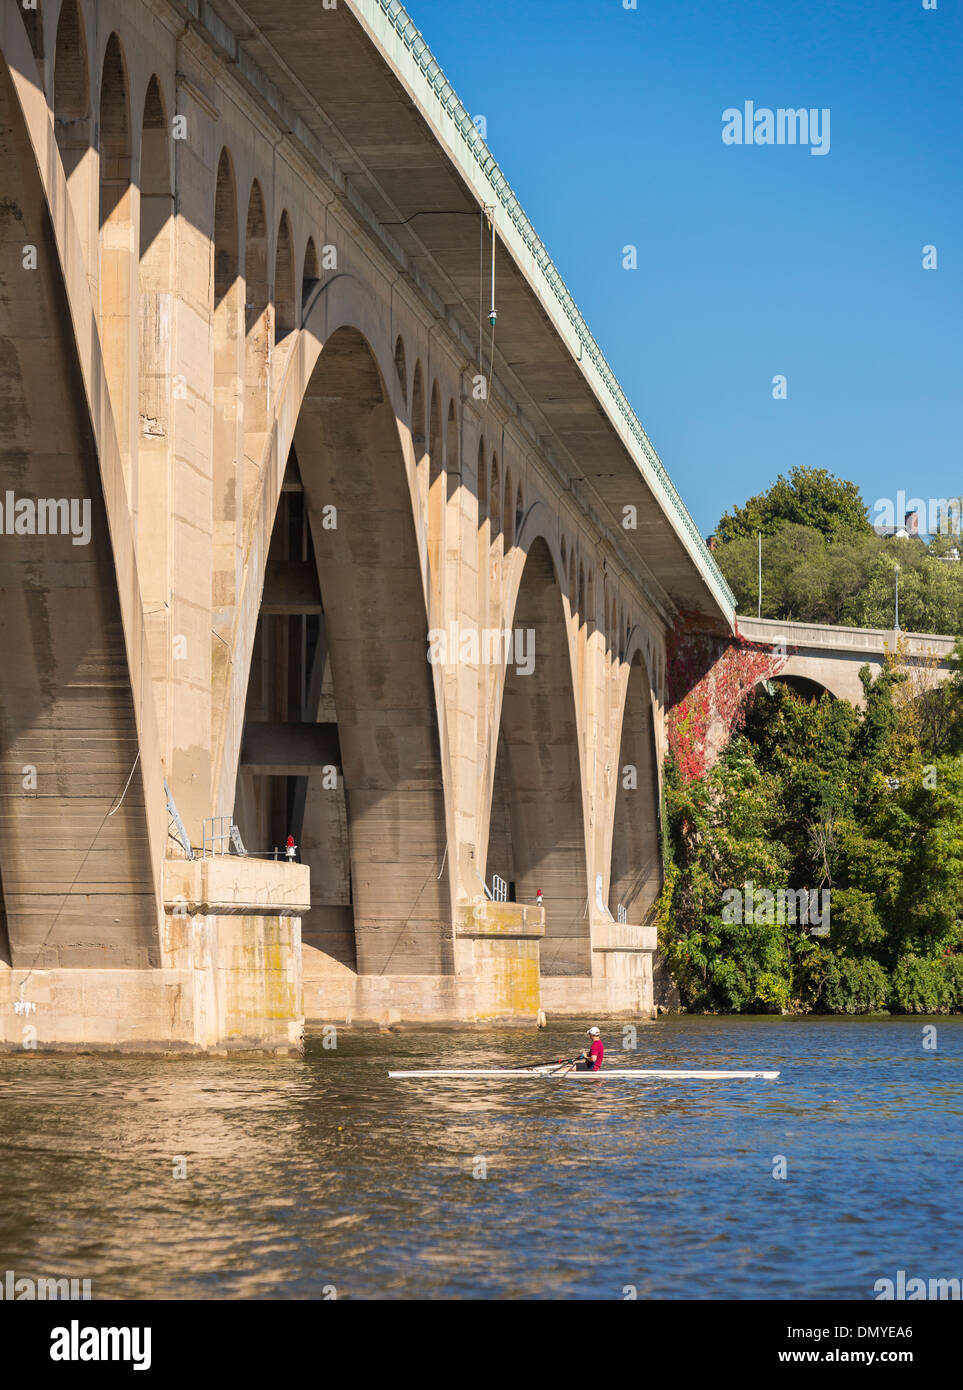 WASHINGTON, DC, Stati Uniti d'America - Key Bridge e vogatore sul Fiume Potomac. Immagini Stock